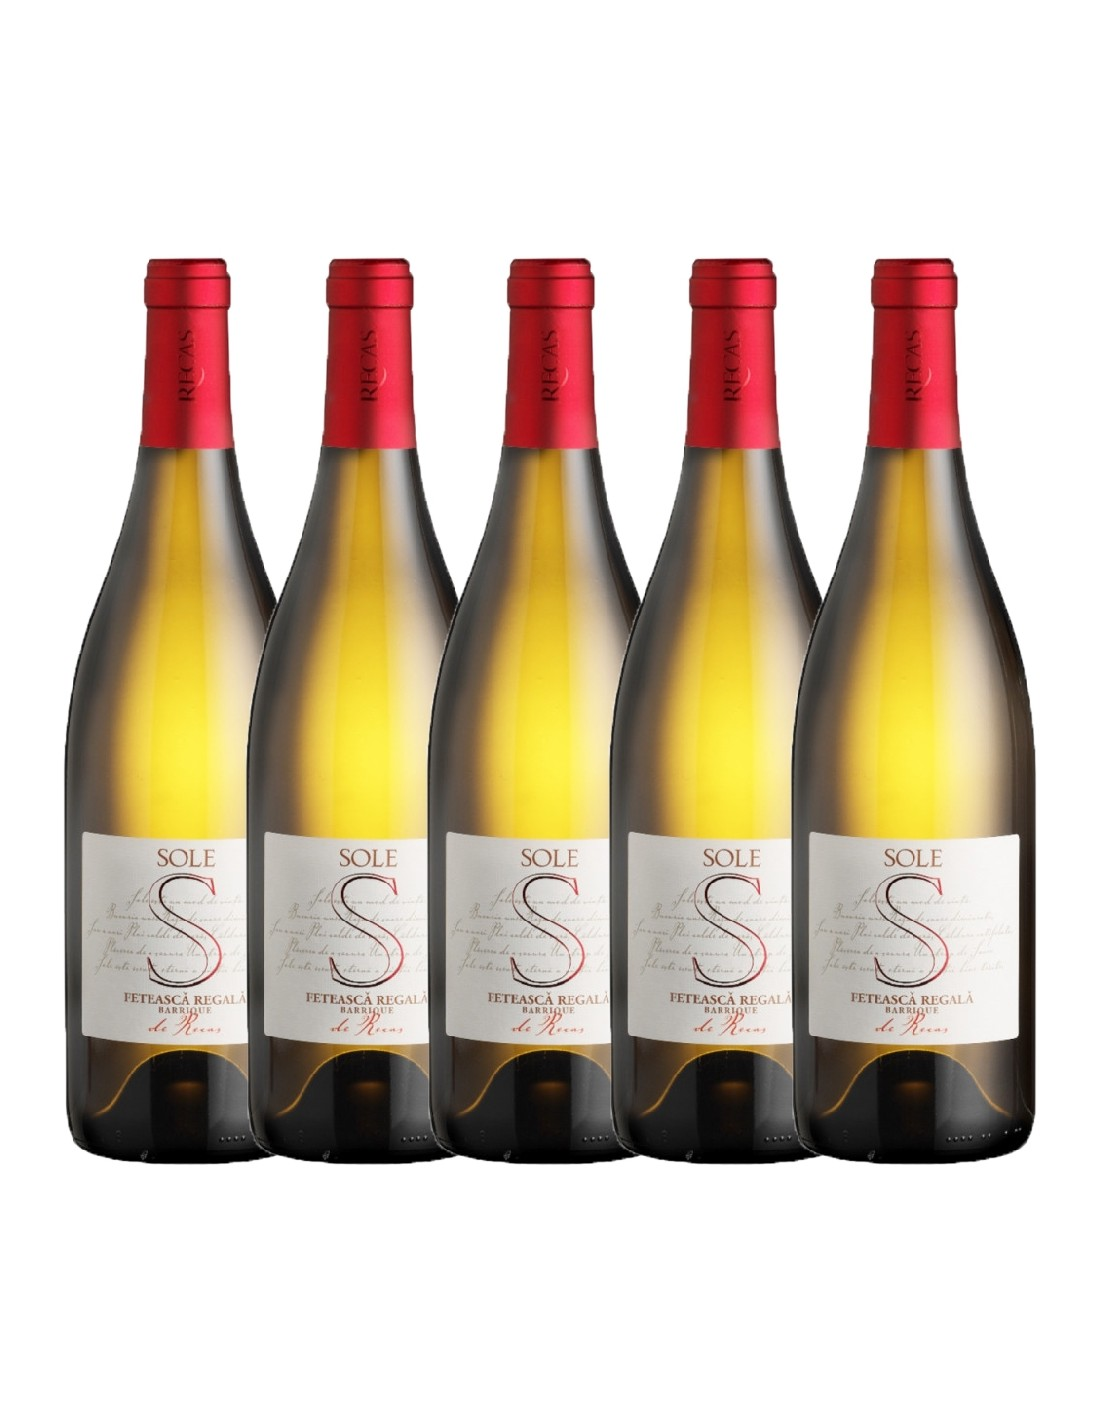 Pachet 5 sticle Vin alb sec, Feteasca Regala, Sole Recas, 0.75L, 13.5% alc., Romania